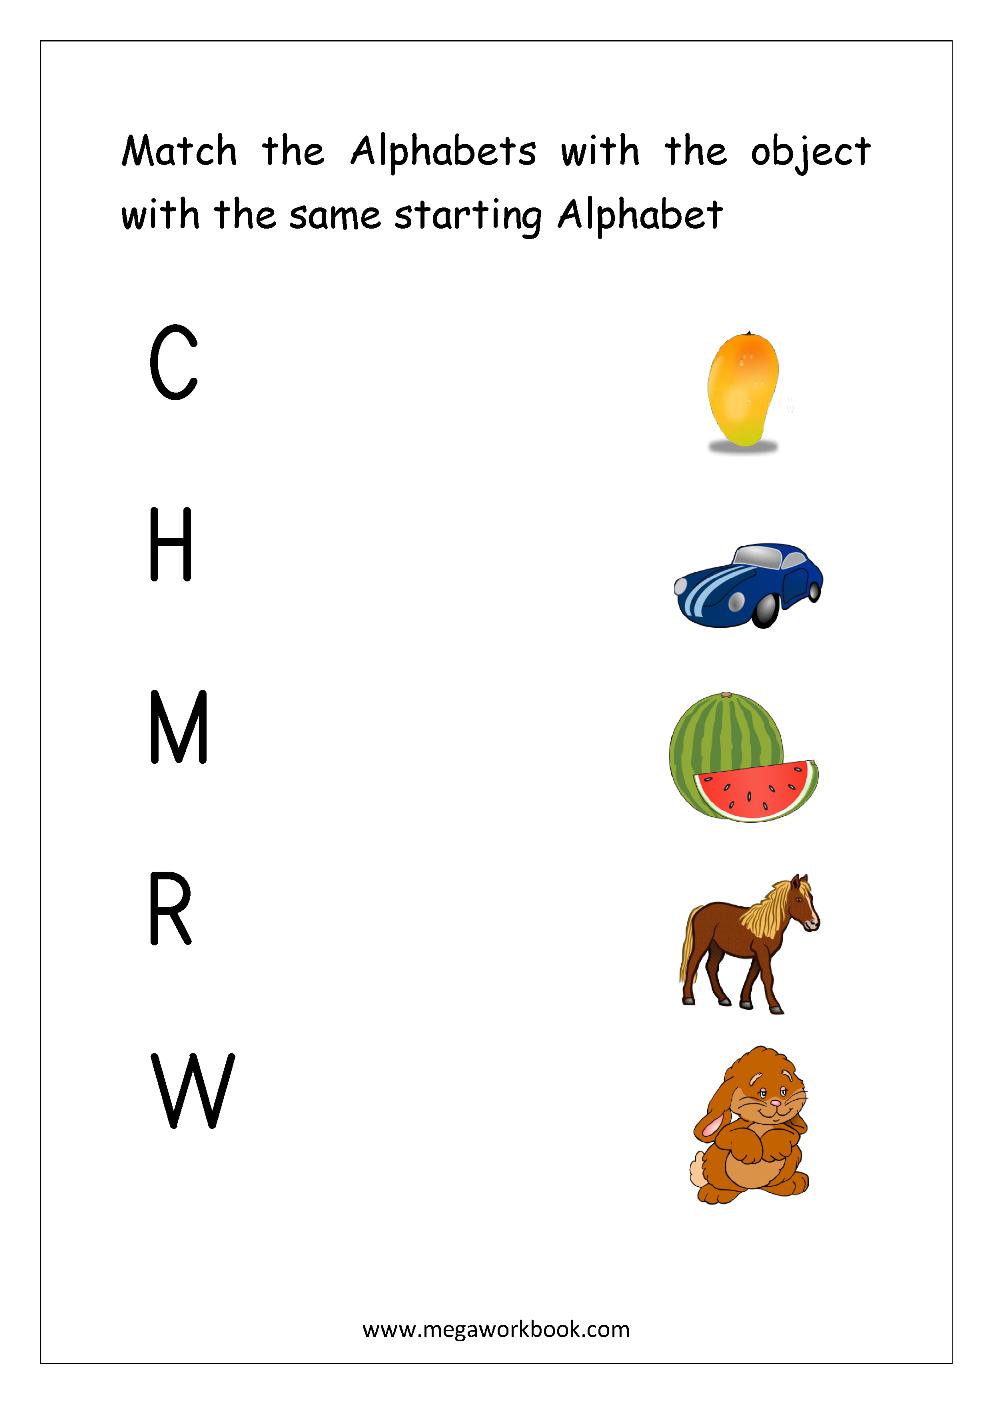 Free English Worksheets - Alphabet Matching - Megaworkbook regarding Alphabet Matching Worksheets For Kindergarten